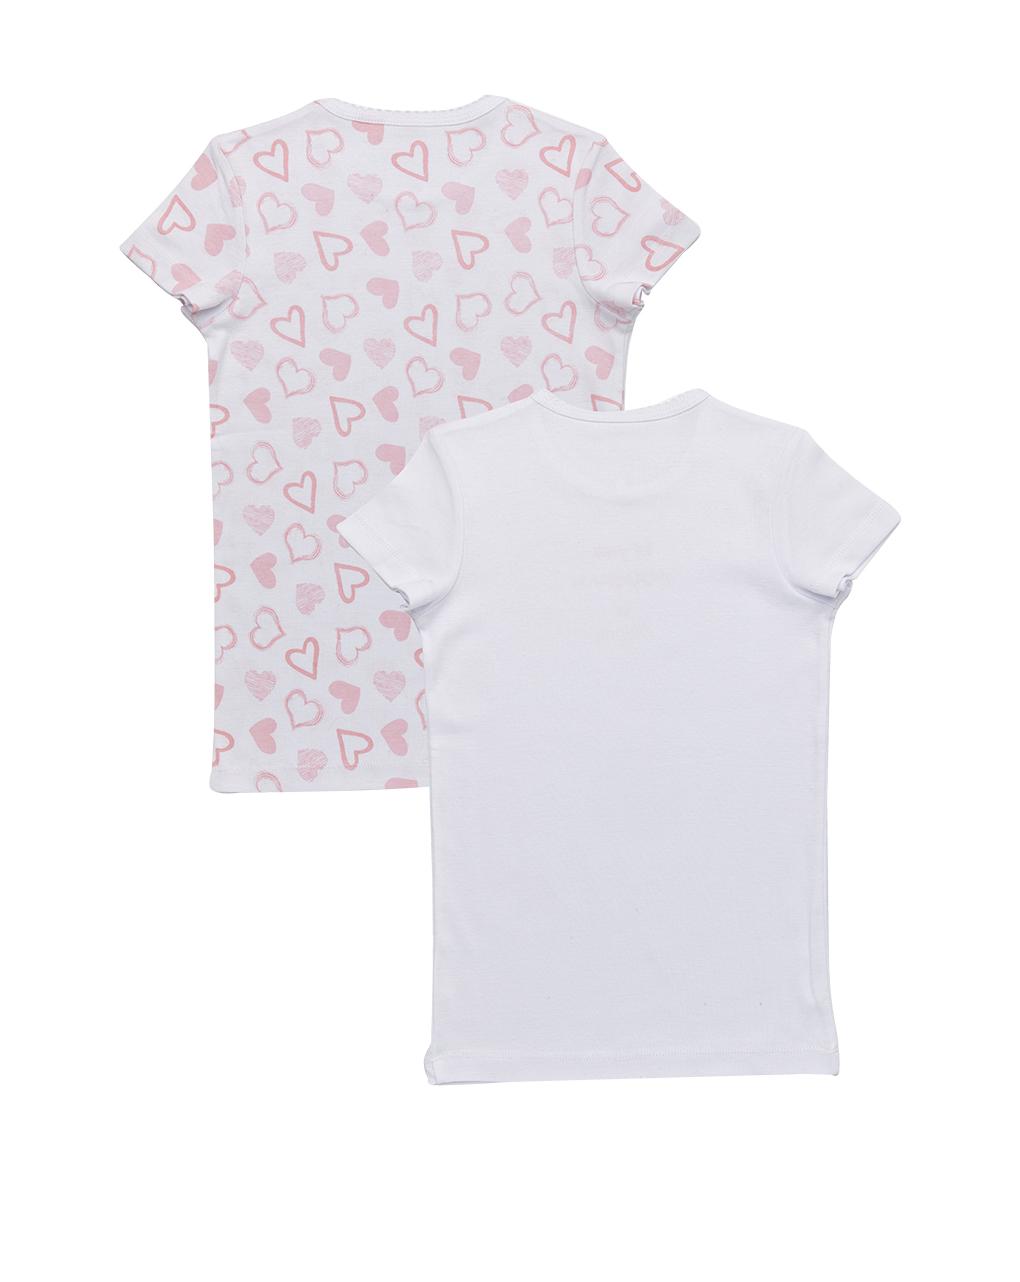 Pack 2 t-shirt stampa cuori - Prénatal